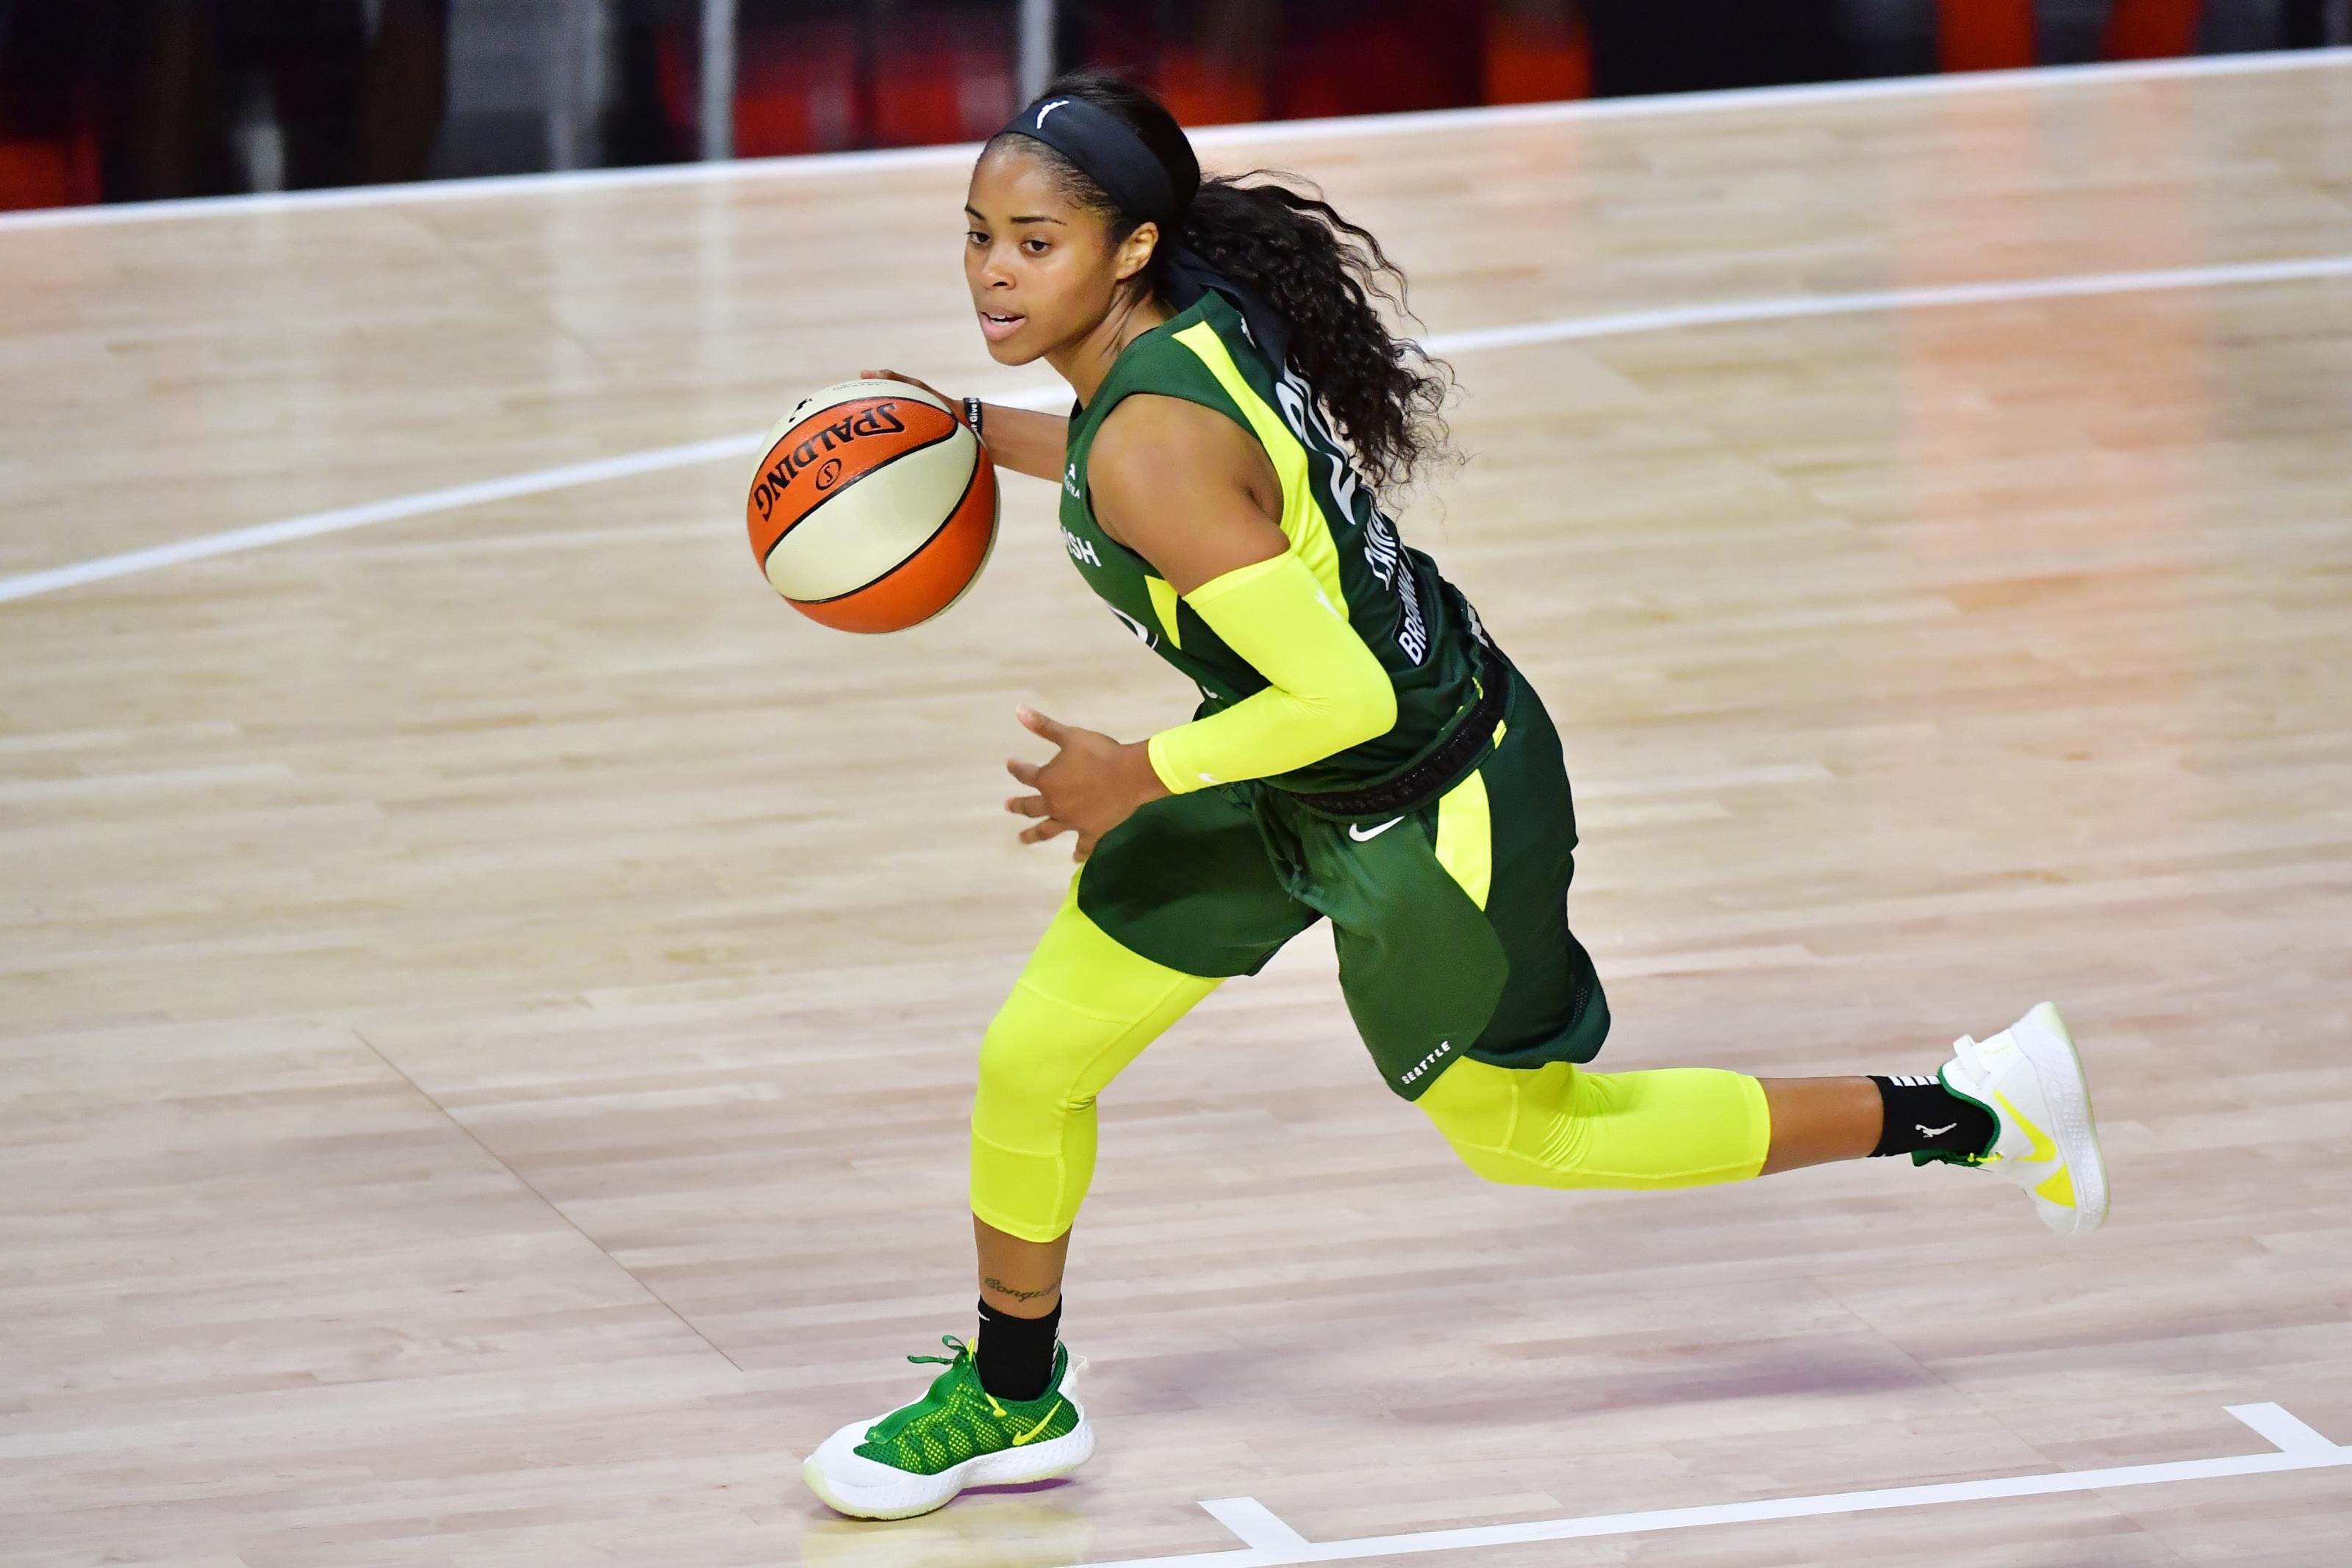 WNBA News, August 5: Jordin Canada's got next for the Storm